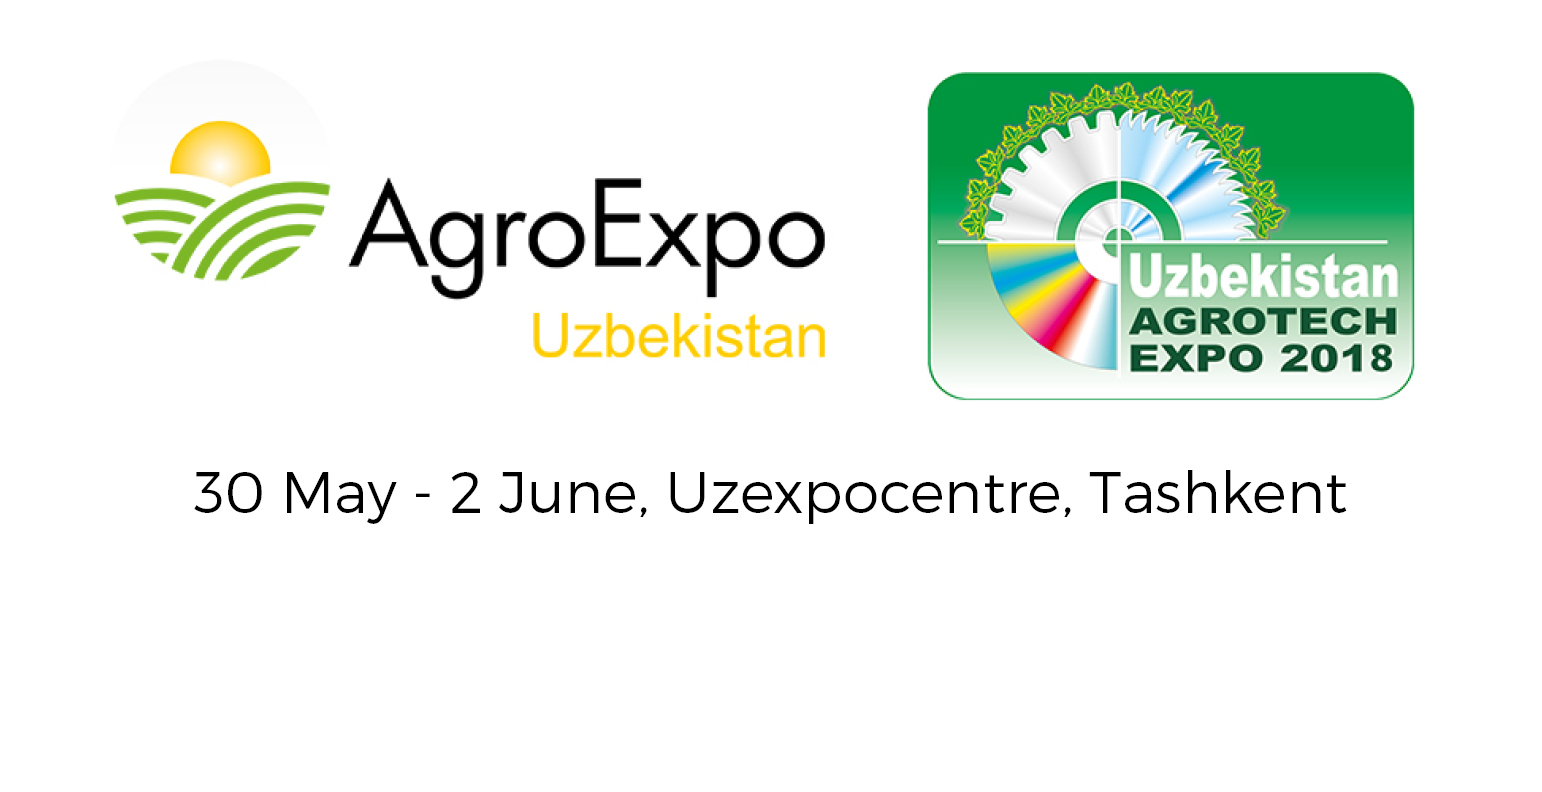 Visit OMEX Agrifluids at AgroExpo Uzbekistan